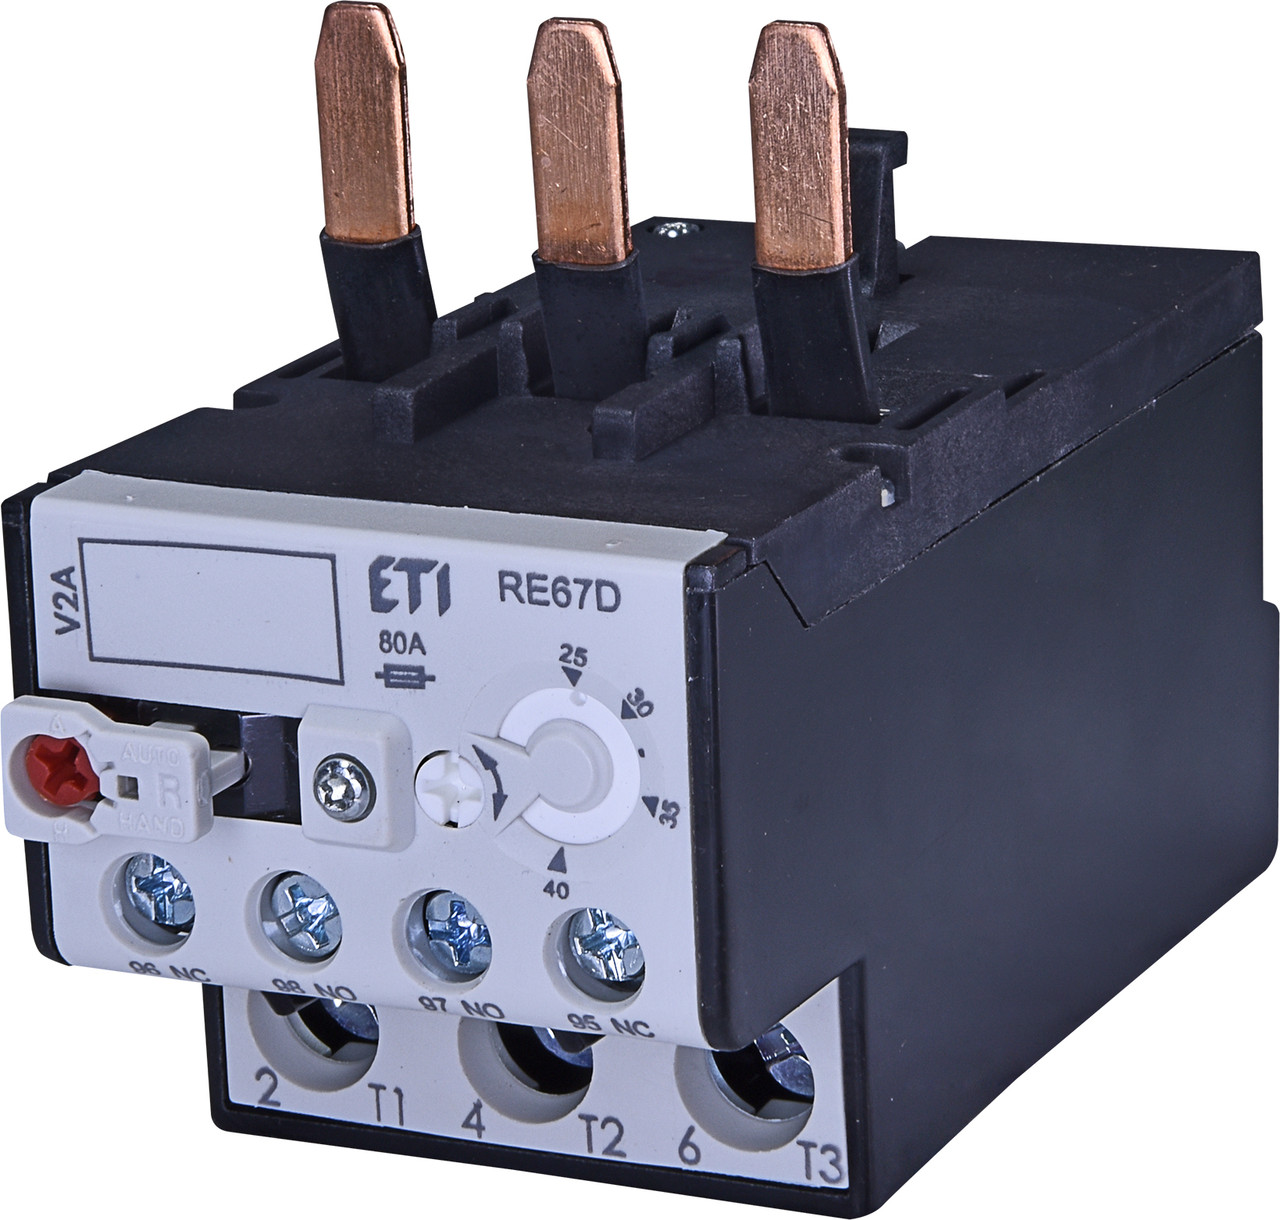 Тепловое реле ETI RE 67.1D-40 (25-40A) CEM32-CEM40 4643415 (для контакторов CEM32-CEM40)